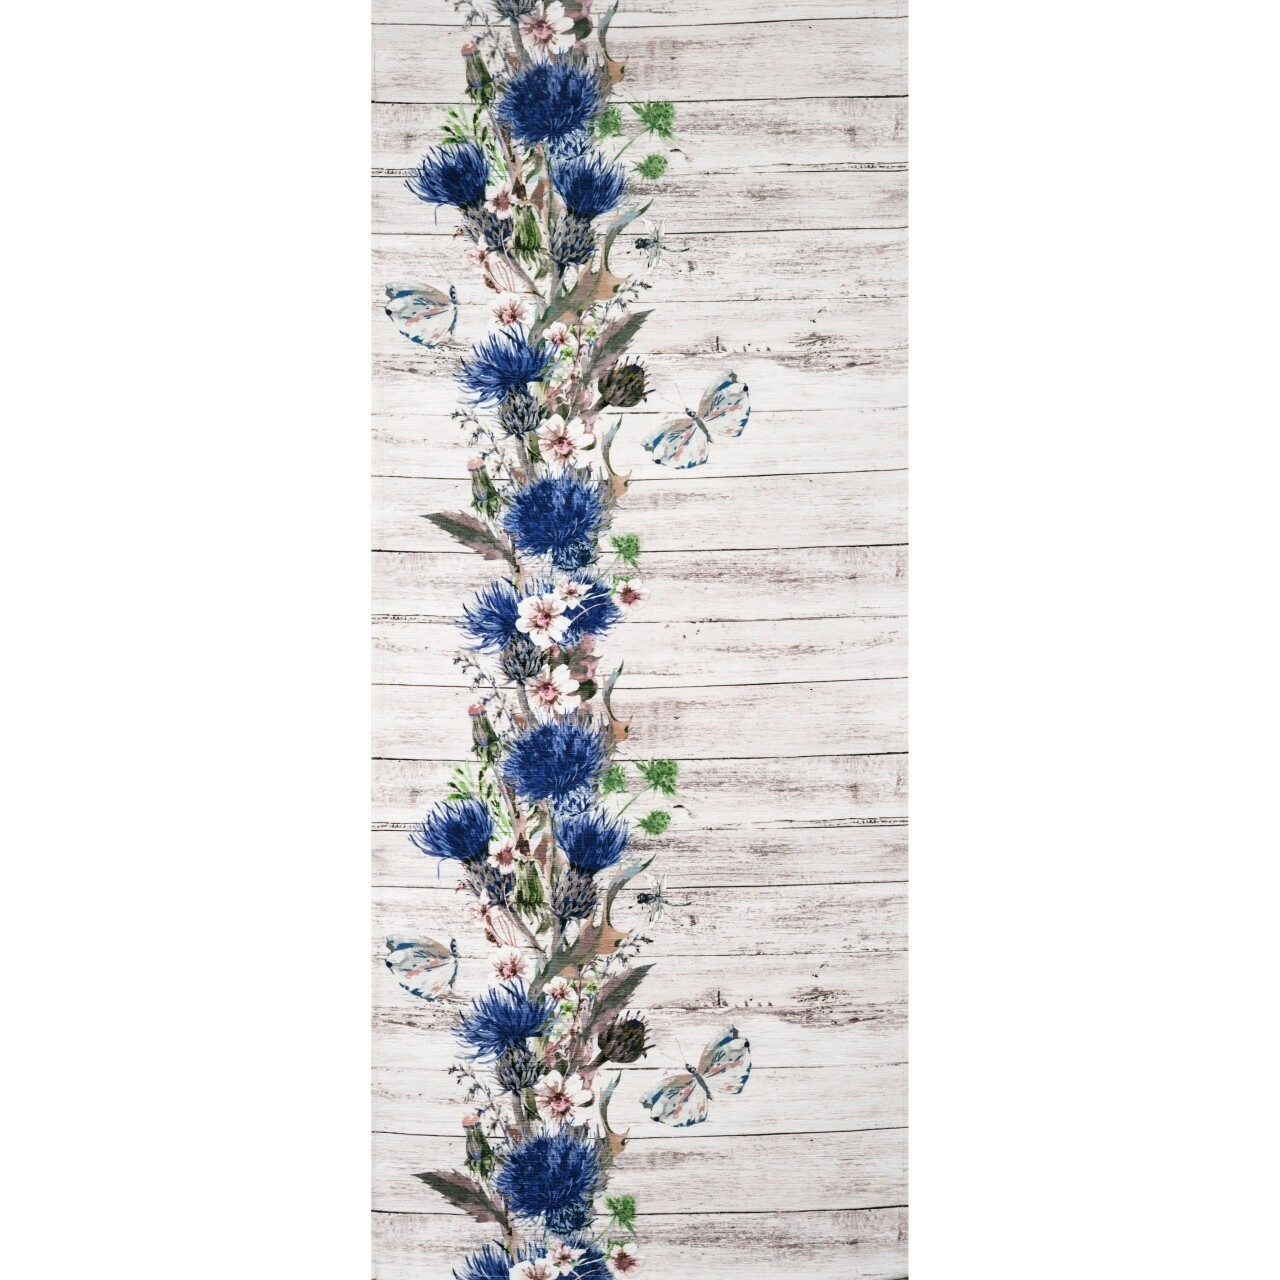 Covor rezistent Webtappeti Fiori Selvatici 58 x 190 cm